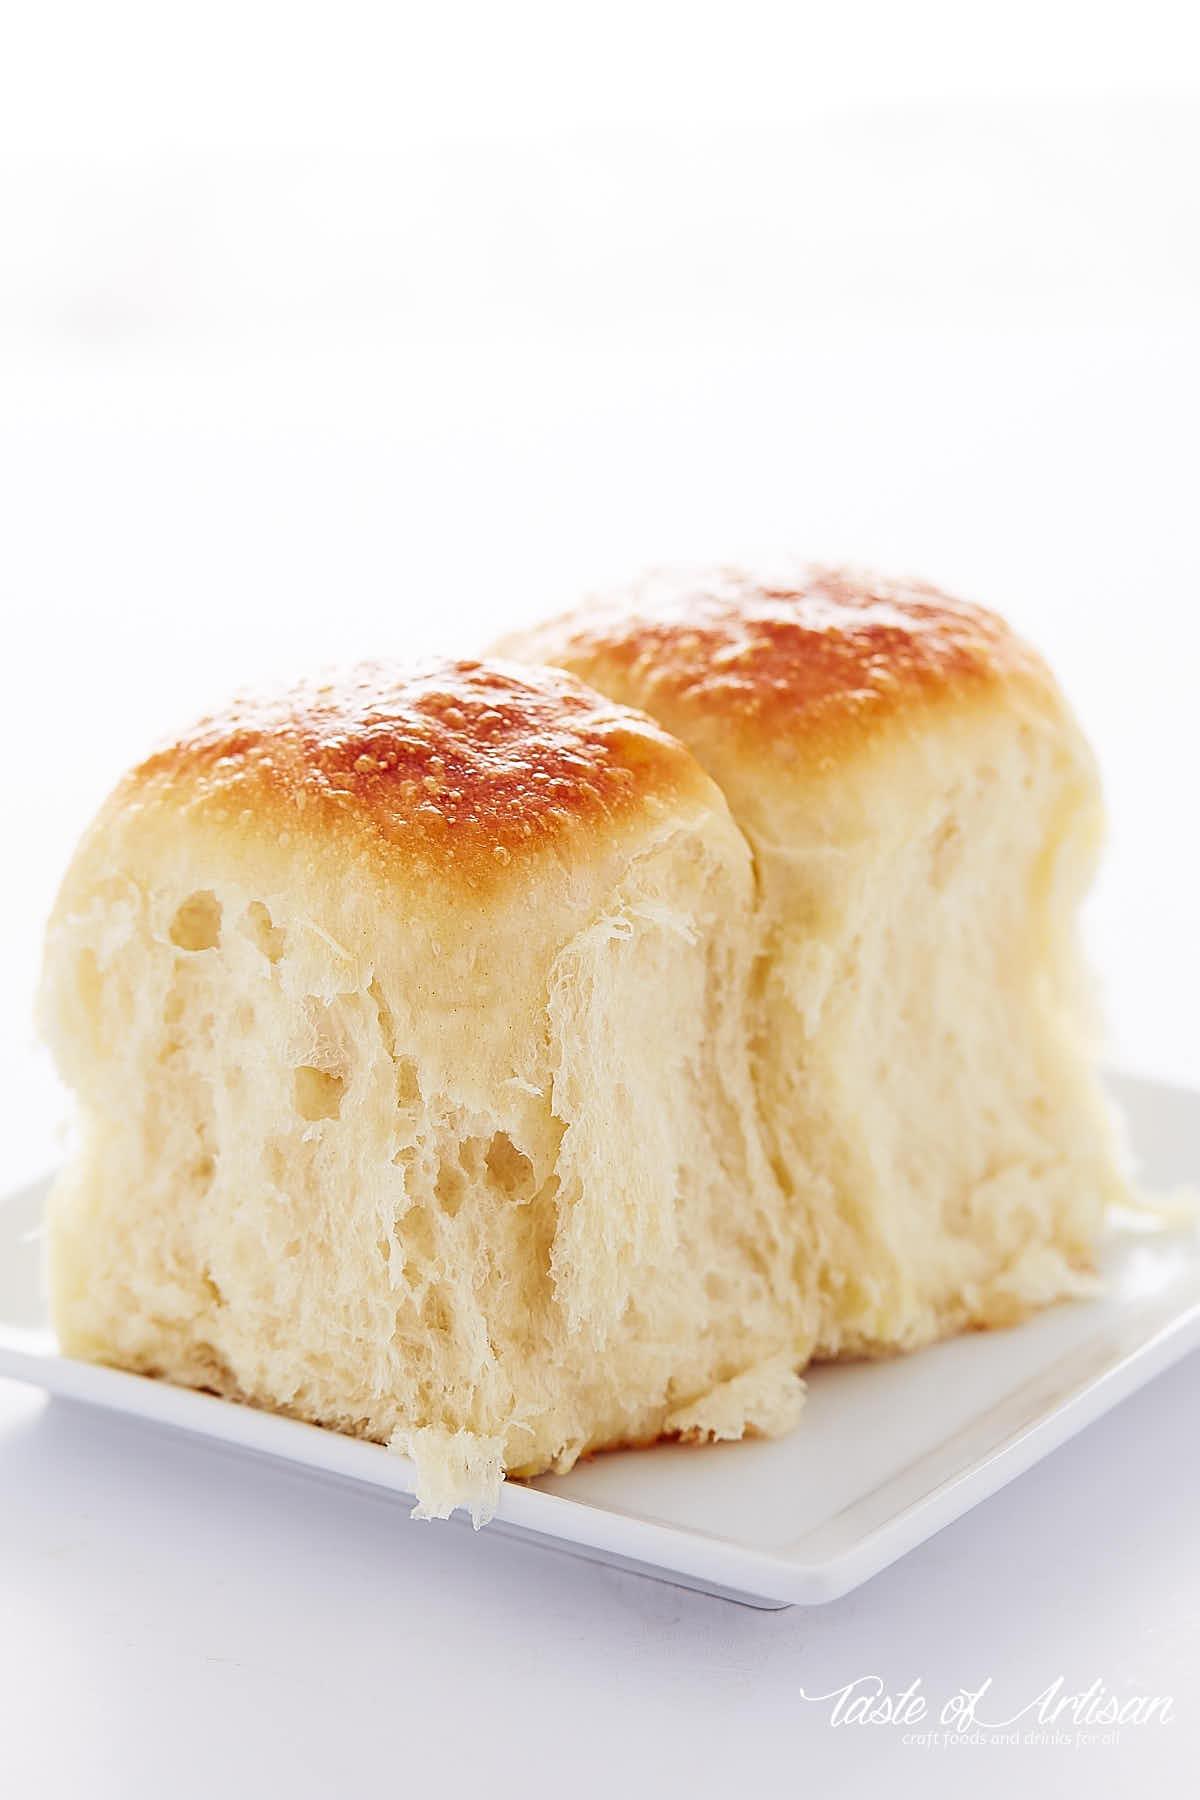 Vanishing Yeast Rolls Taste Of Artisan